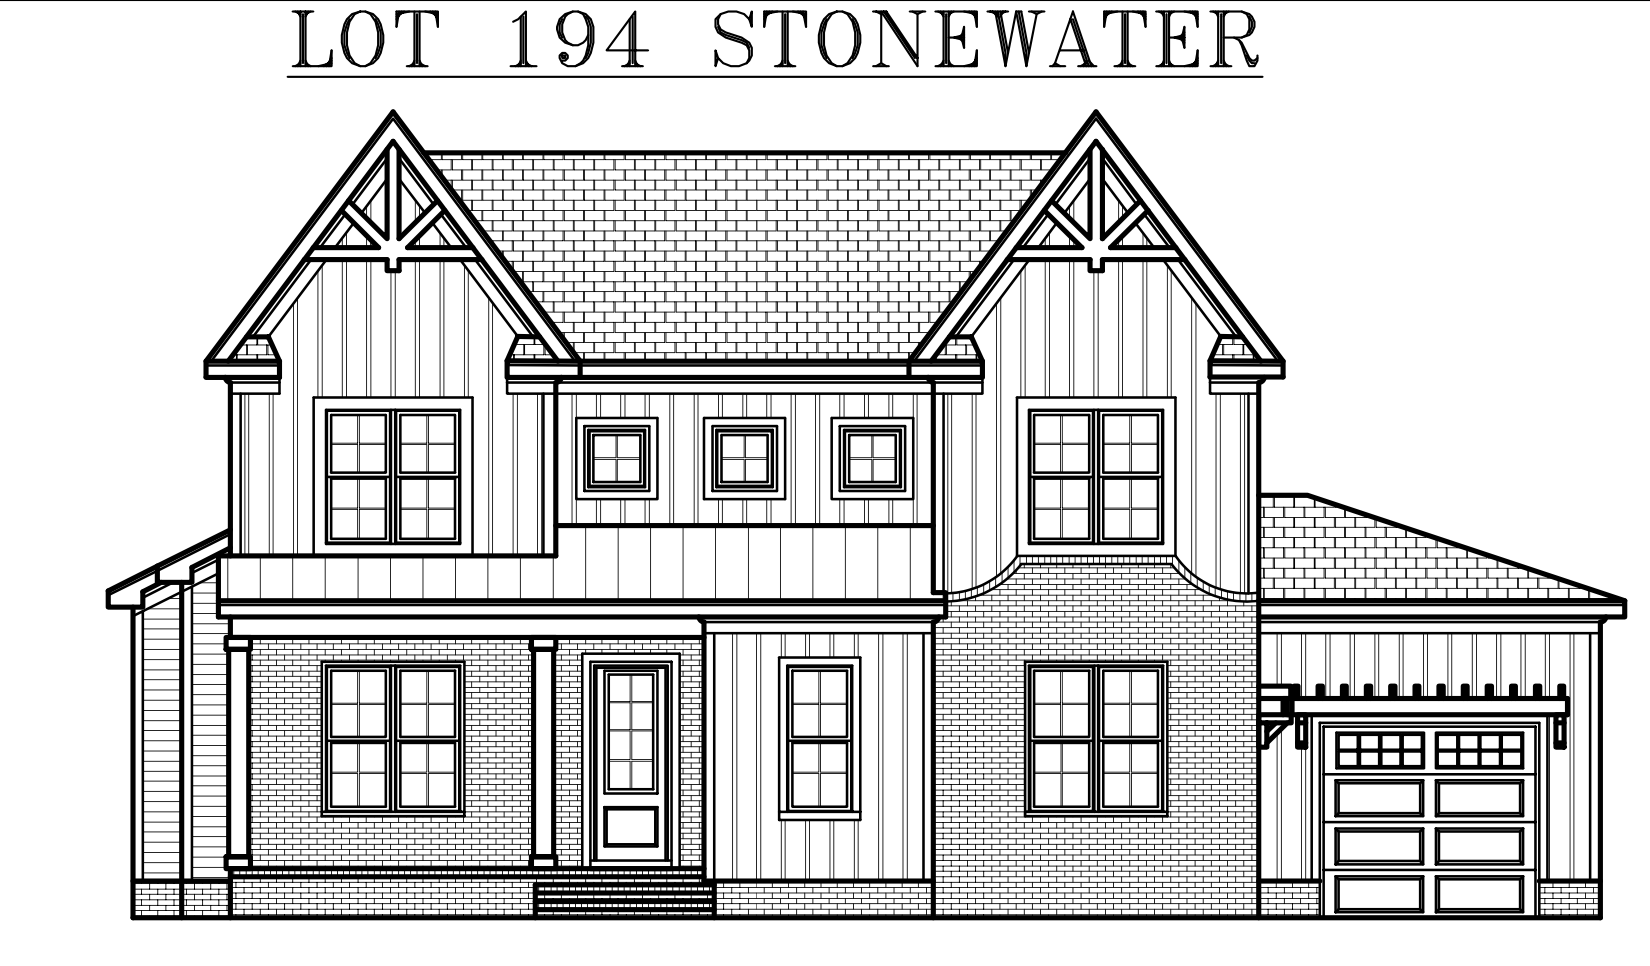 194 Stonewater